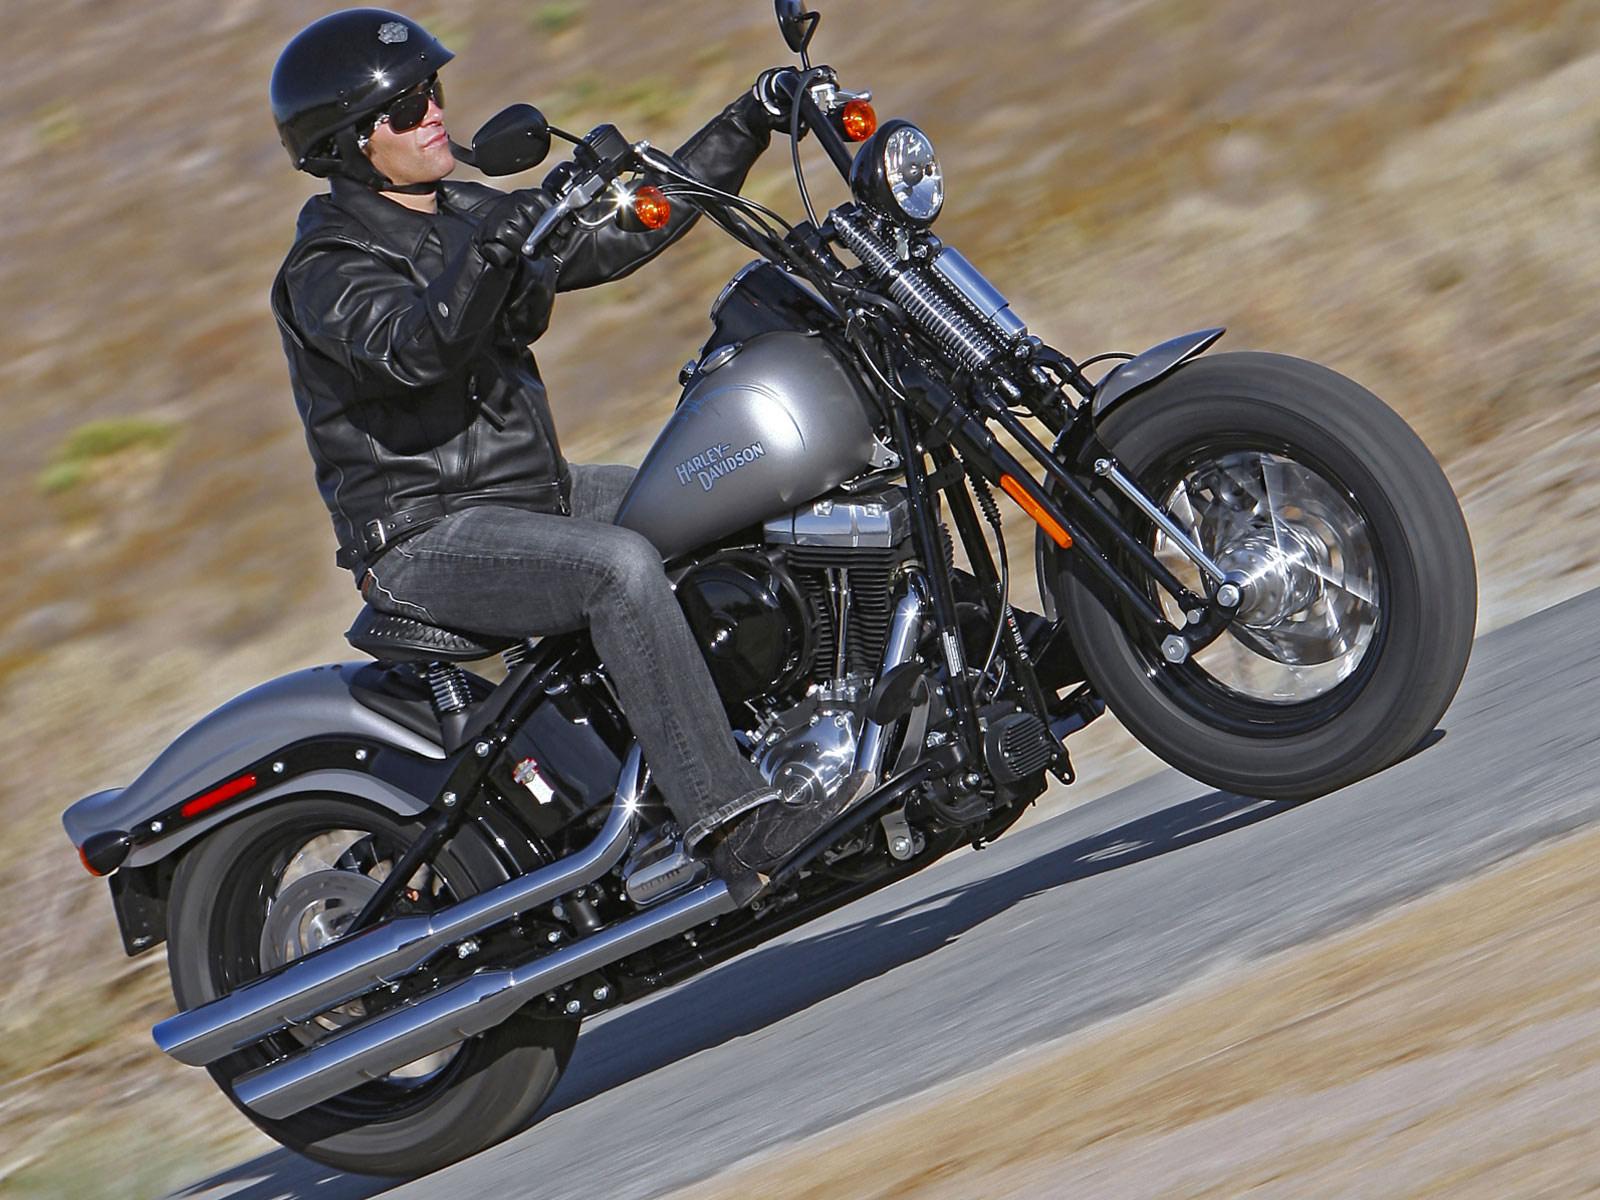 Harley Davidson: Harley-Davidson Pictures. 2008 FLSTB Softail Cross Bones